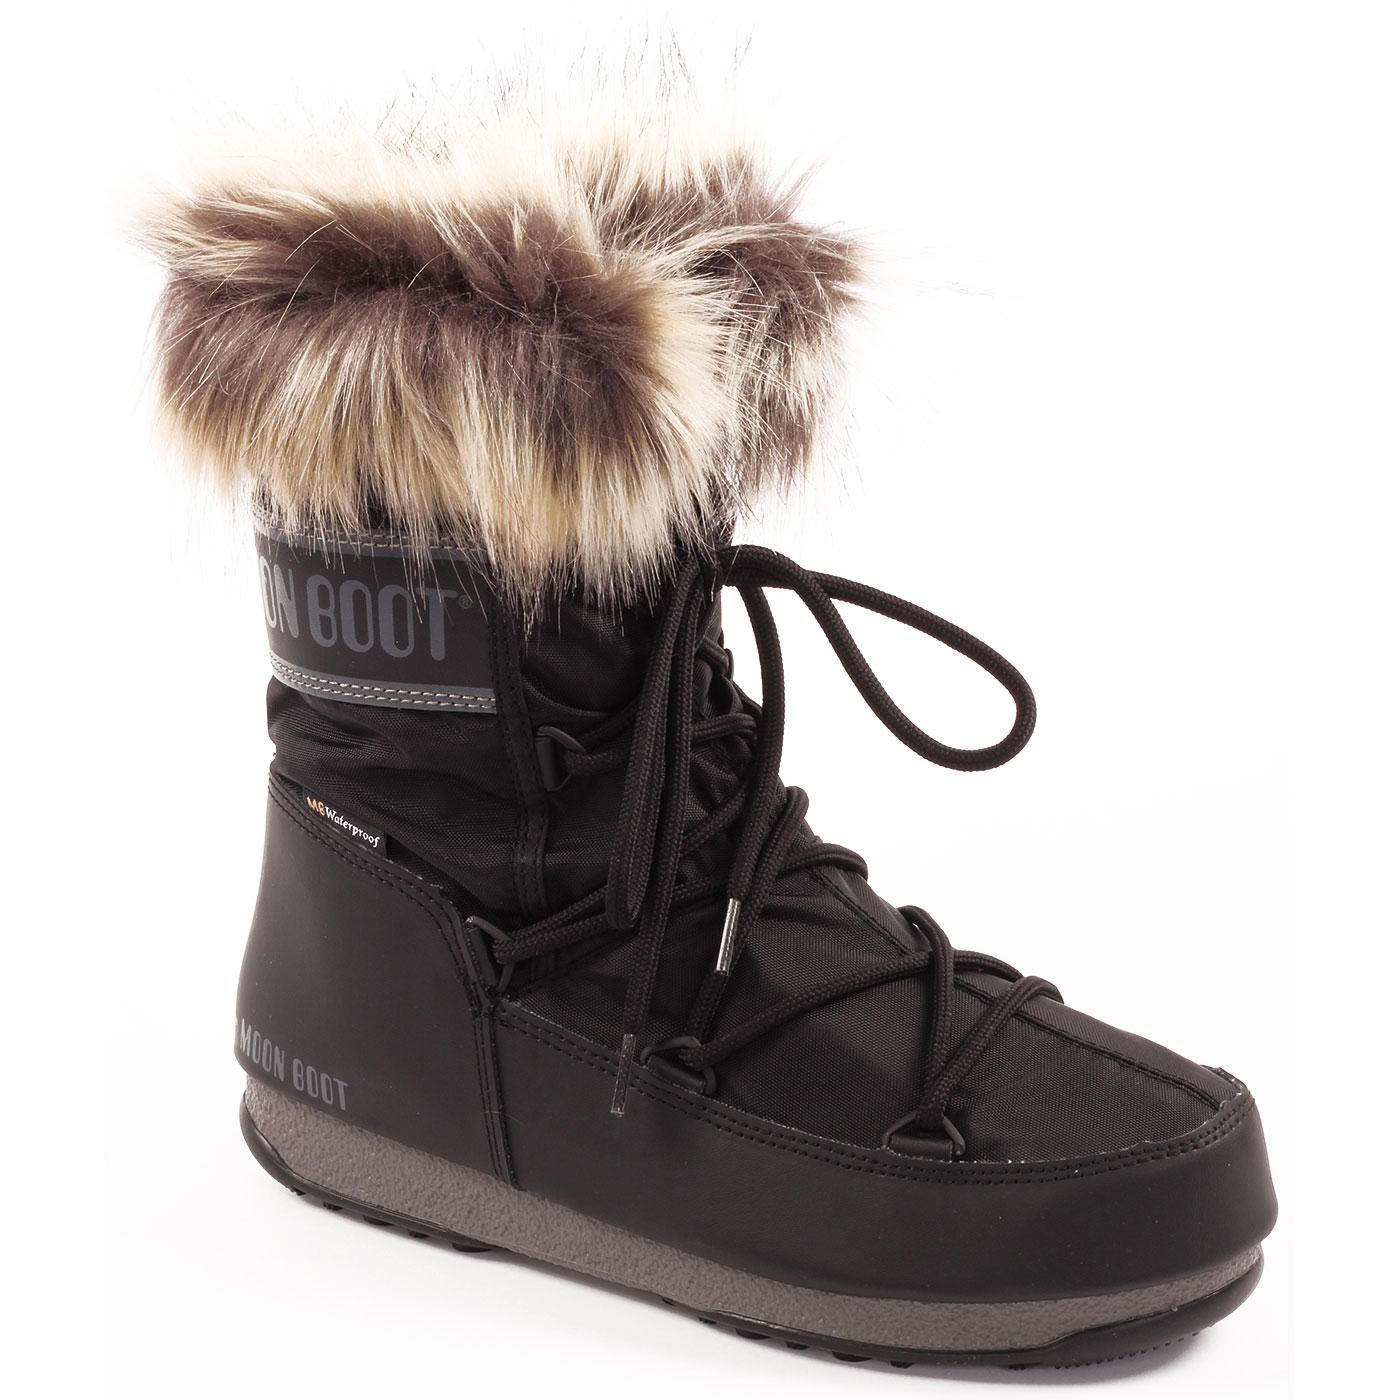 MOON BOOT Monaco Low Retro 70s Winter Boots B